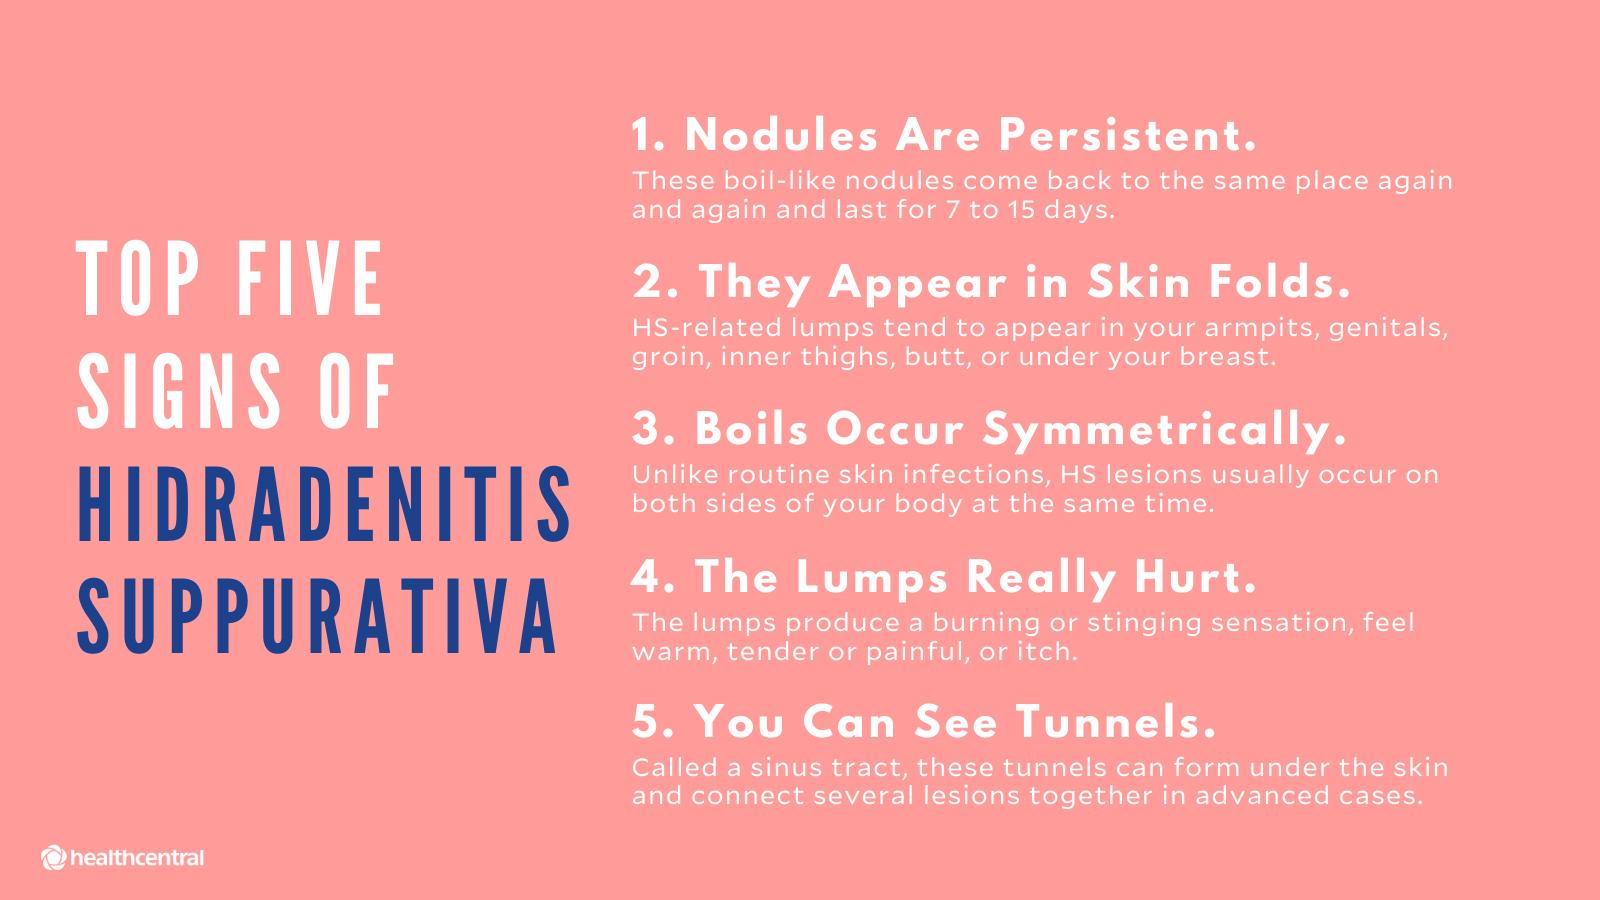 Hidradenitis Suppurativa Symptoms Causes Diagnosis Treatments And More